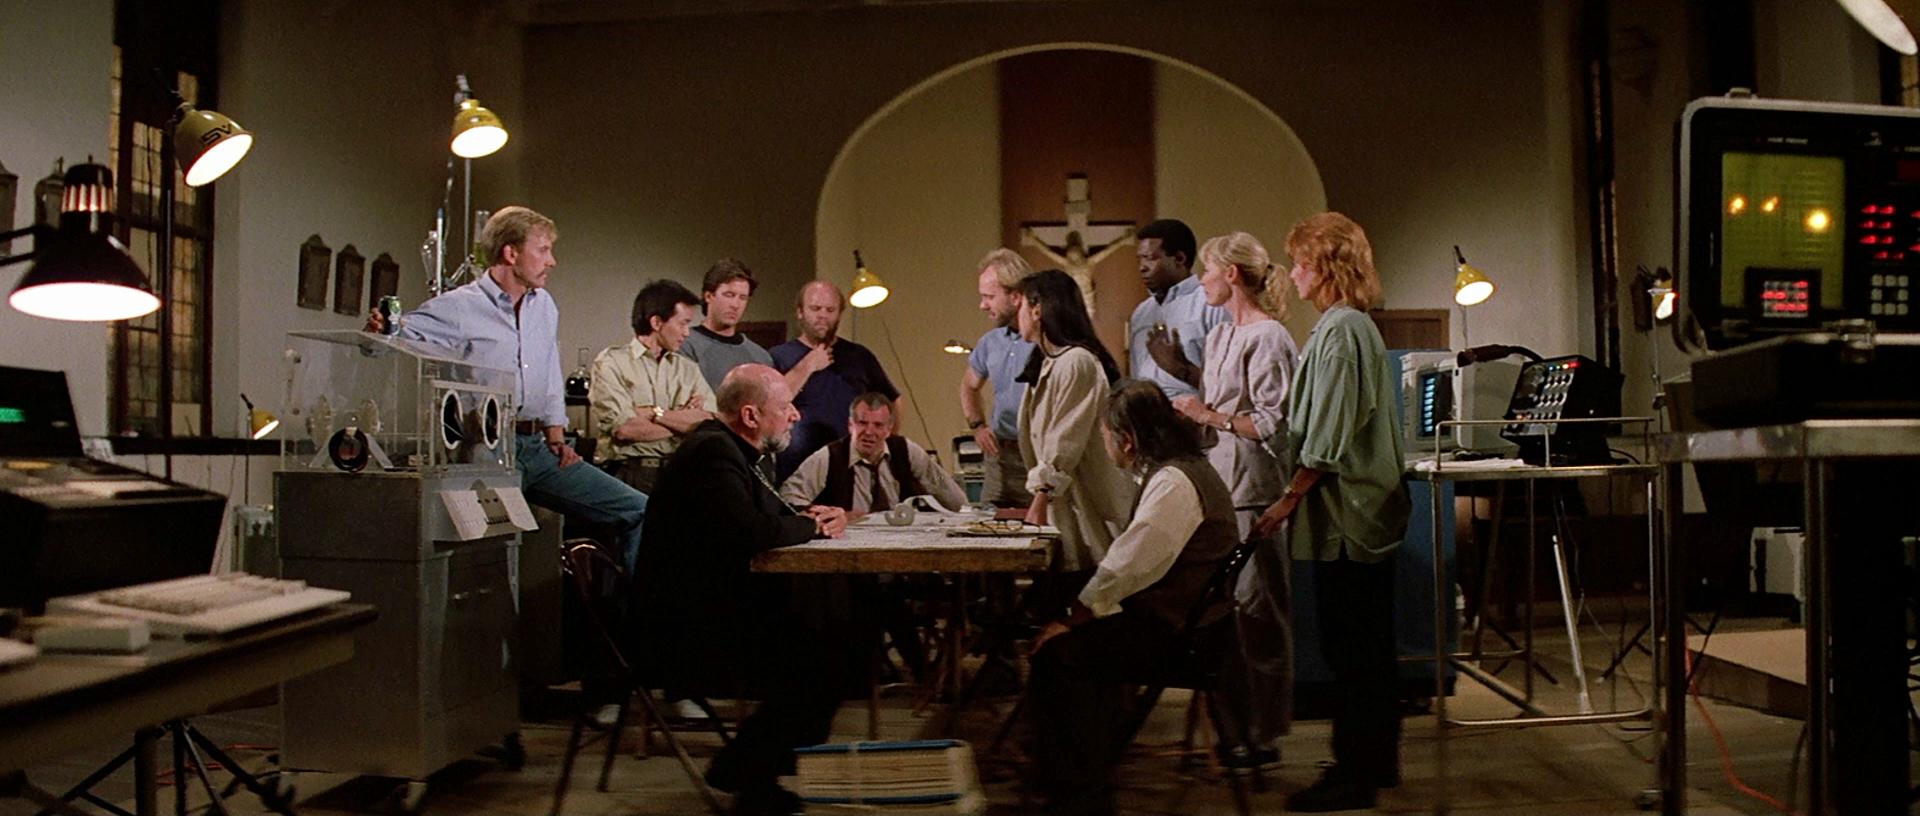 Prince des Ténèbres : Critique du film de John Carpenter.